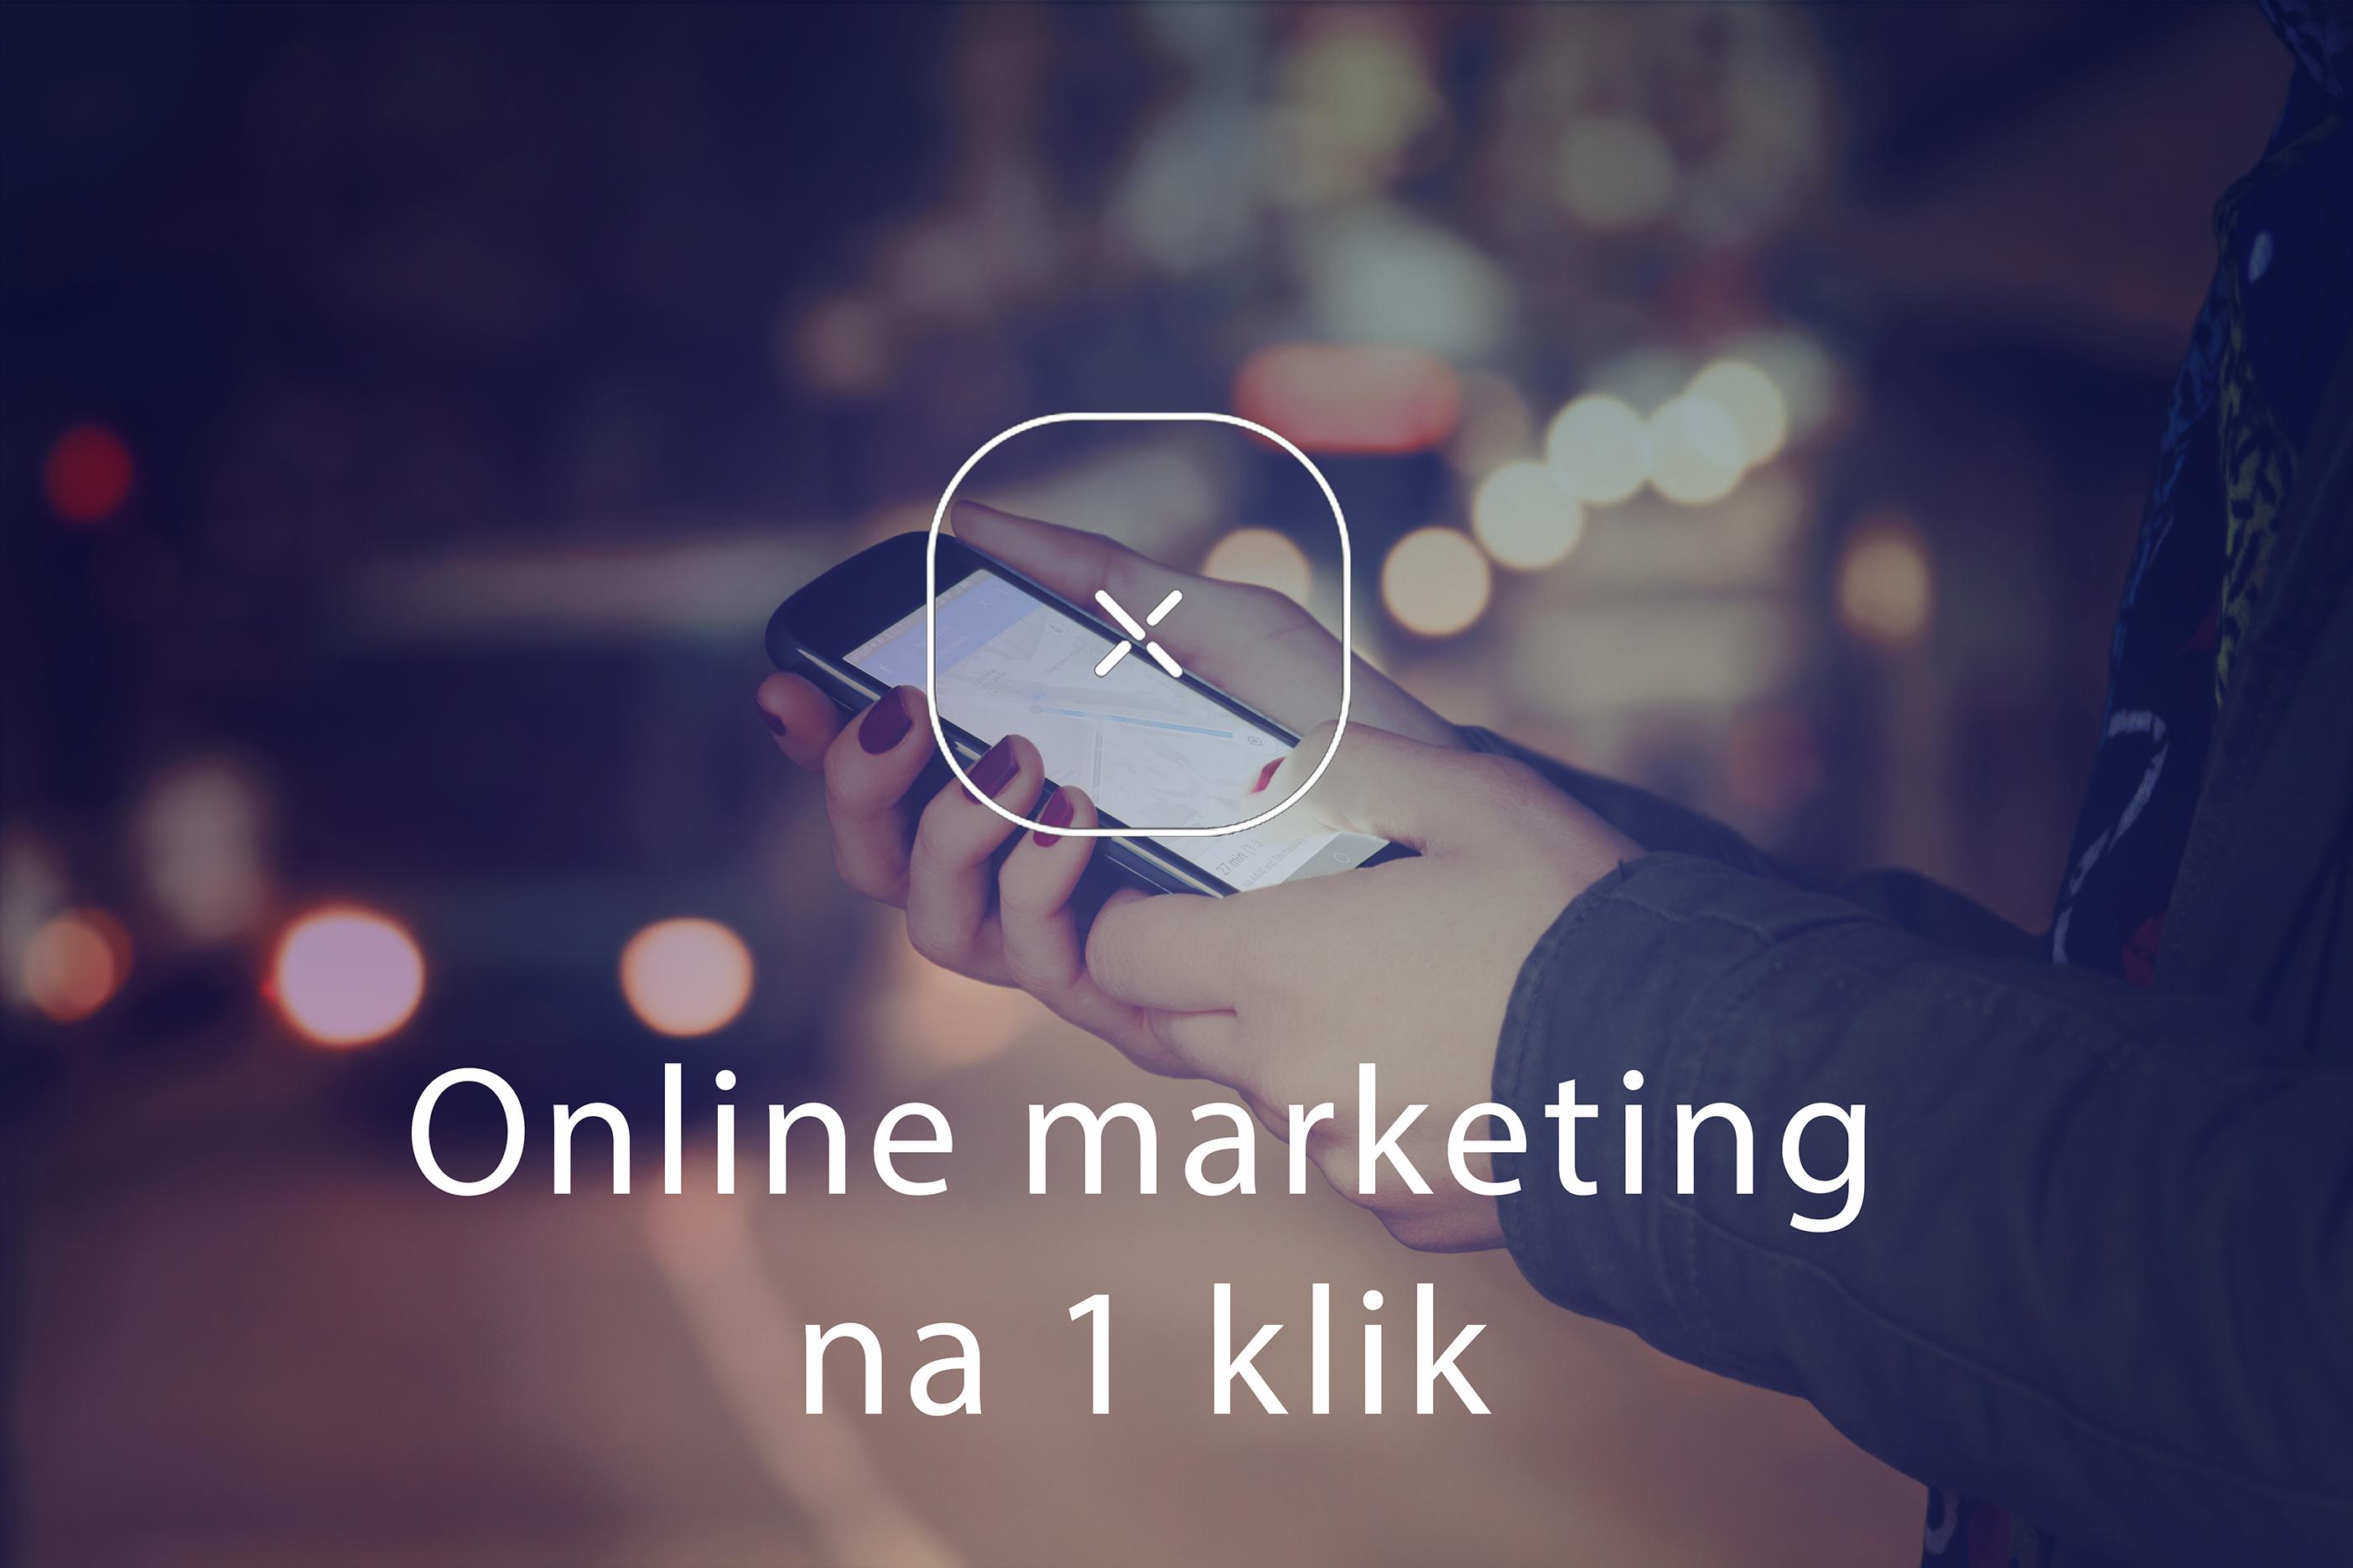 Online marketing na 1 klik